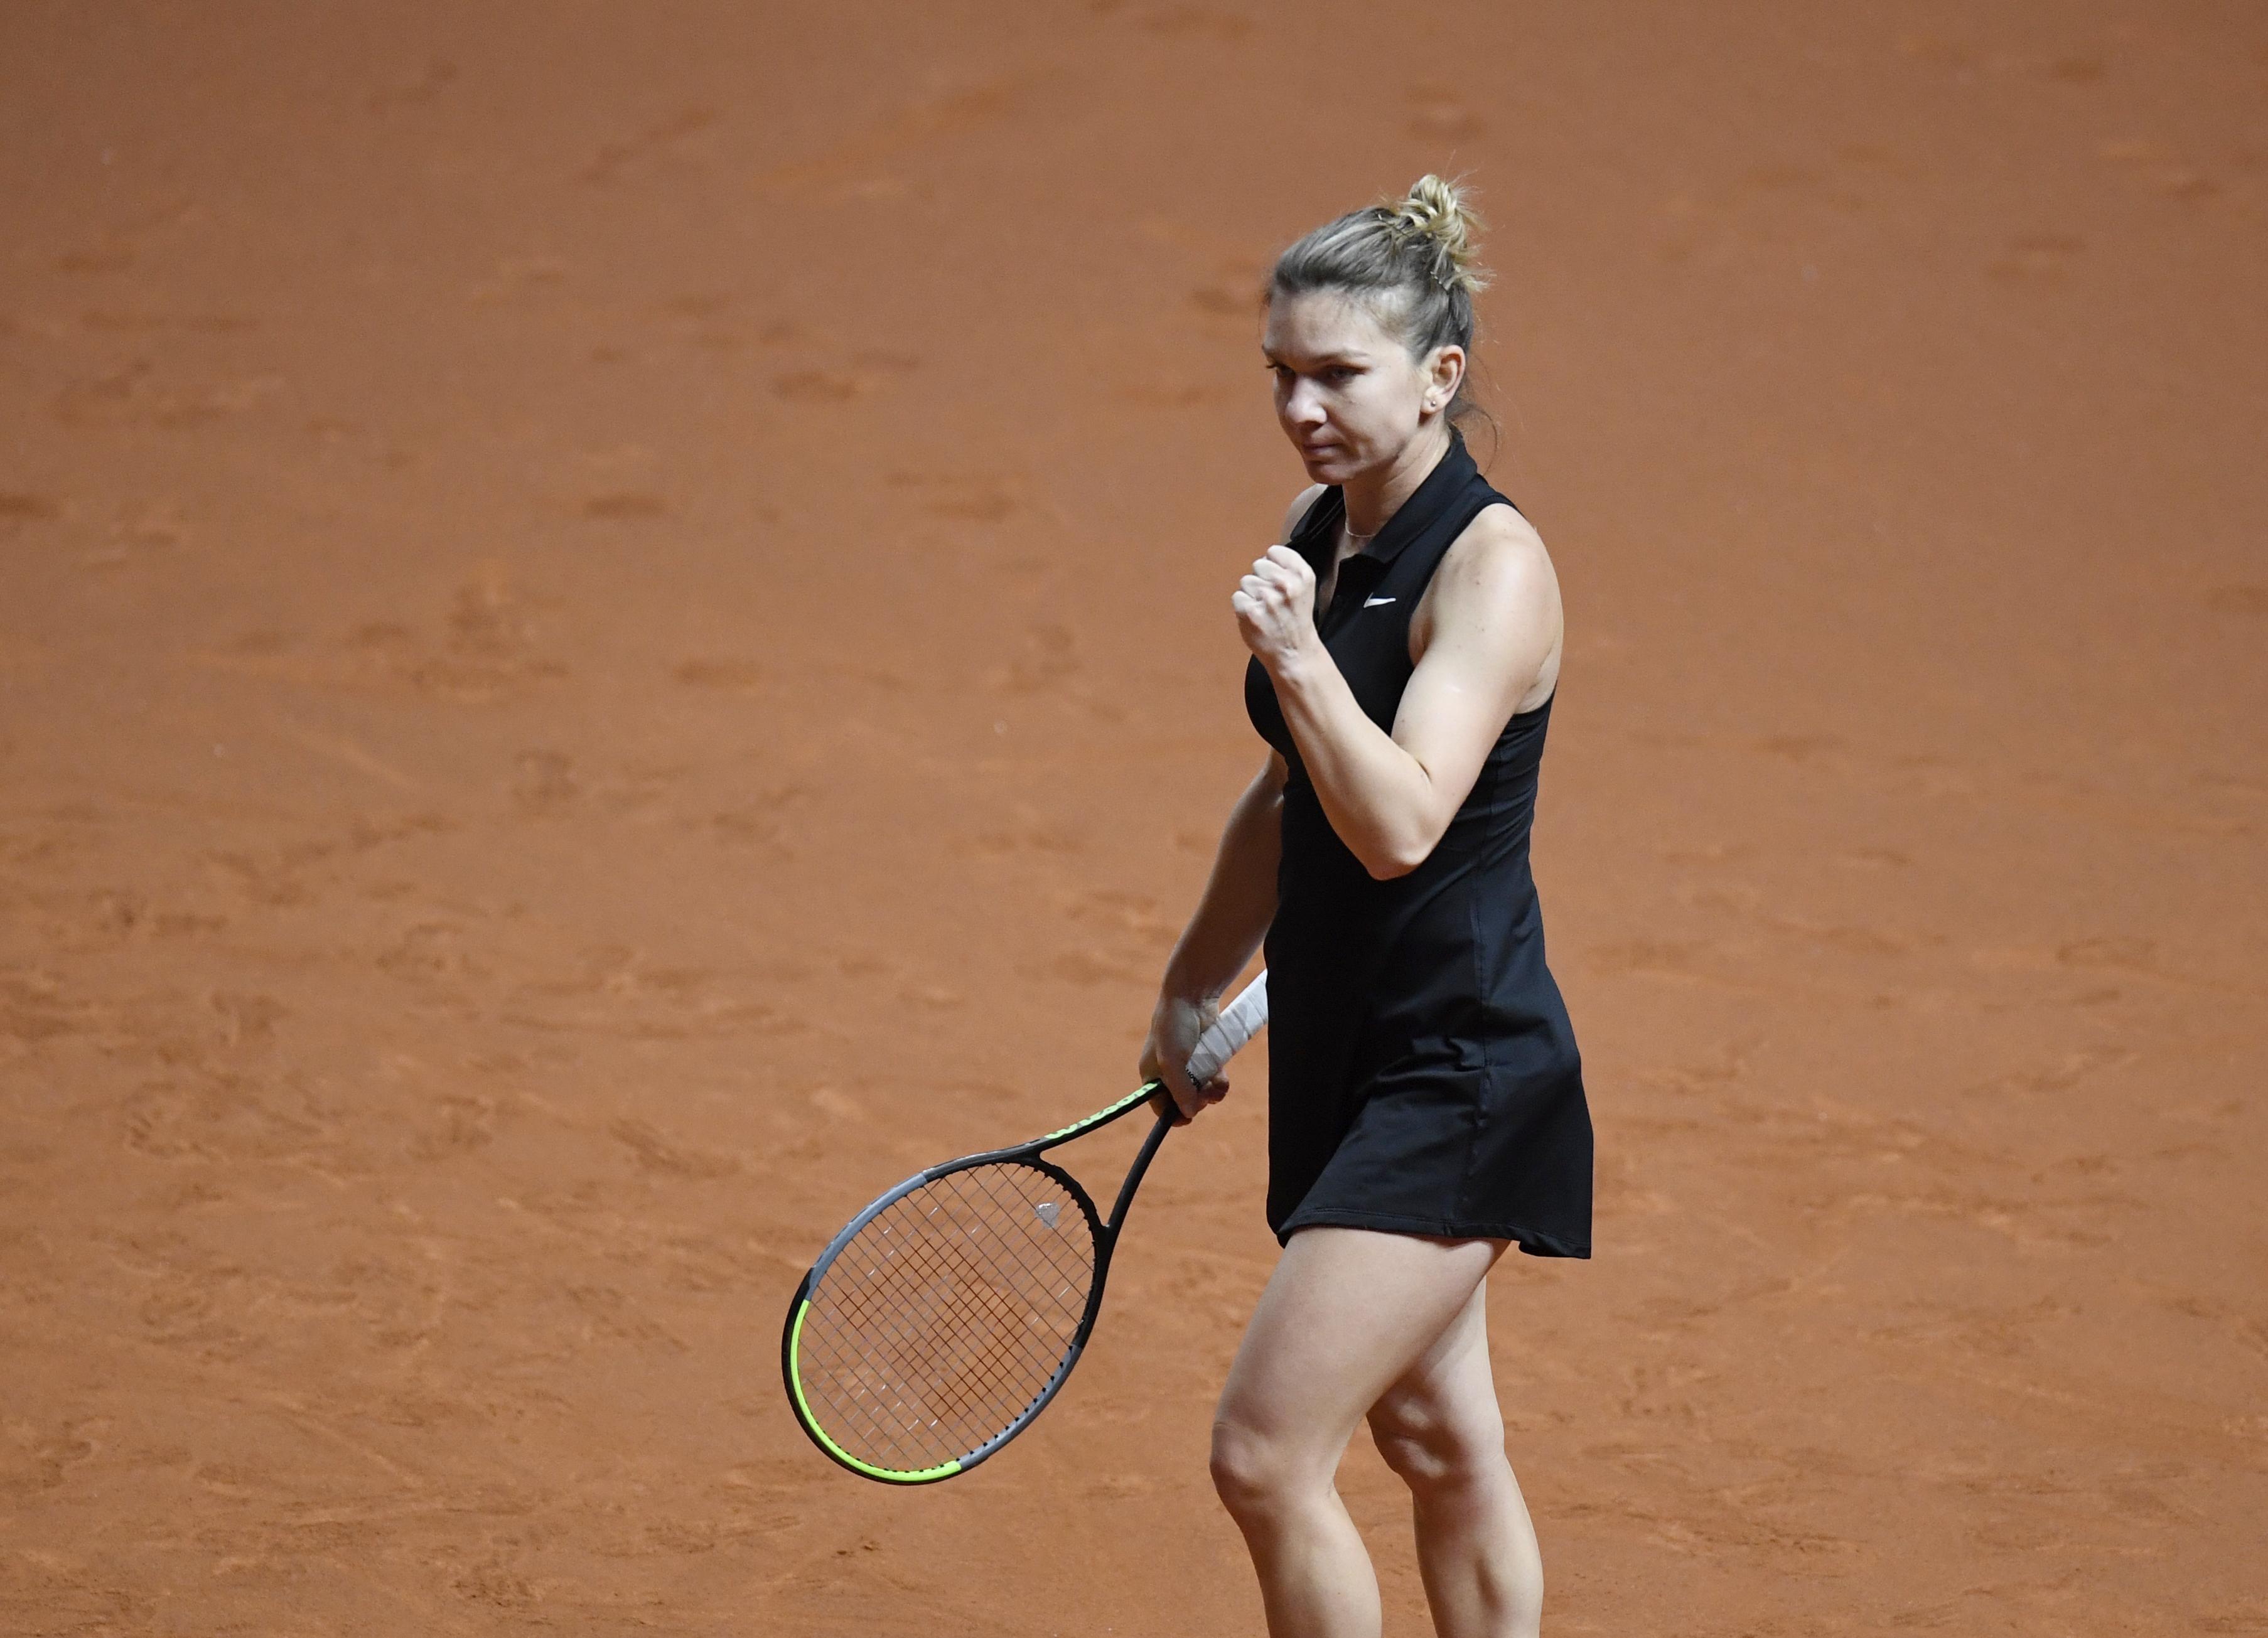 WTA Madrid Open 2021: Simona Halep vs. Sara Sorribes Tormo Tennis Pick and Prediction